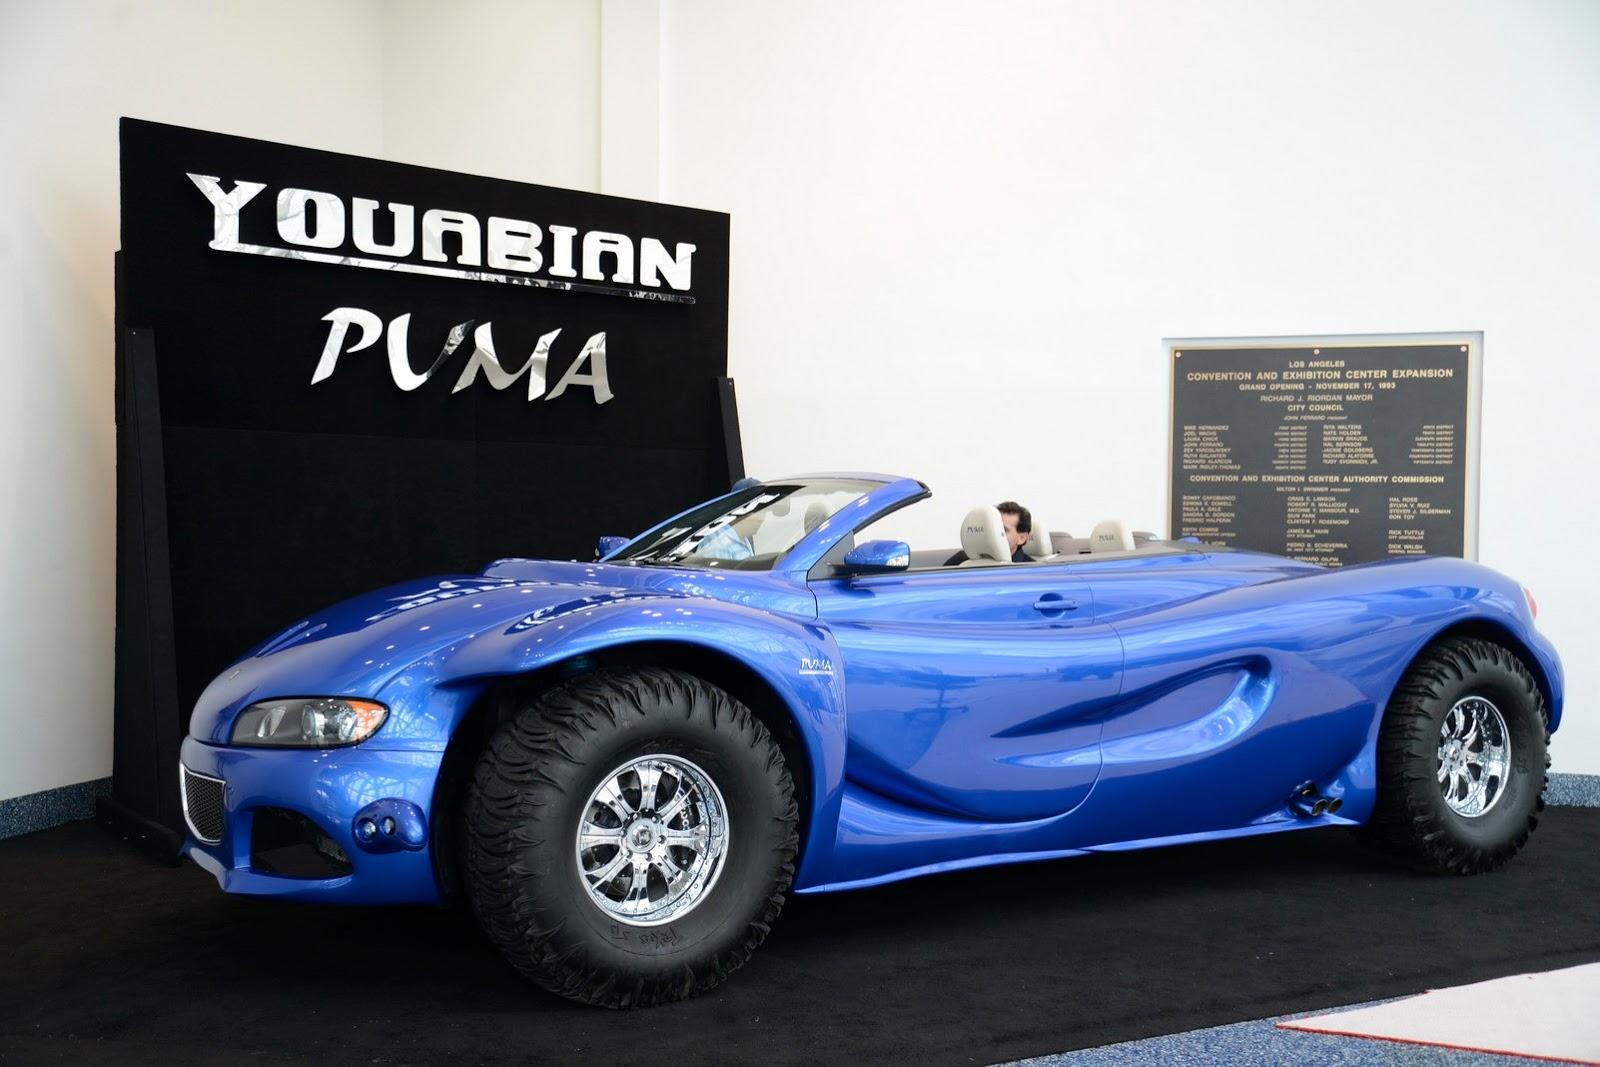 Youabian-Puma-3%25255B2%25255D.jpg